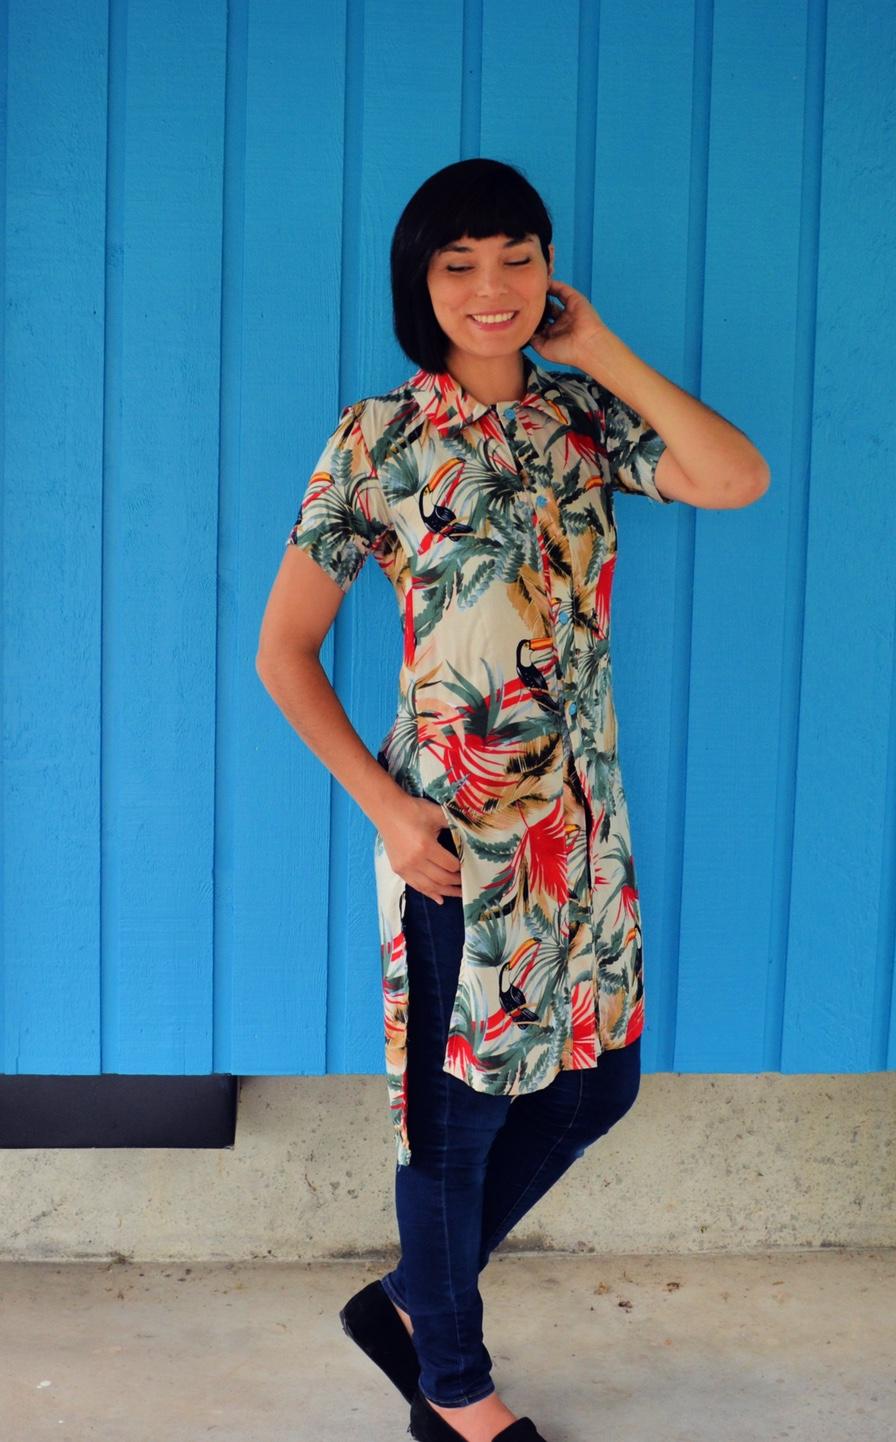 Magnolia Shirt/Tunic from DG Patterns